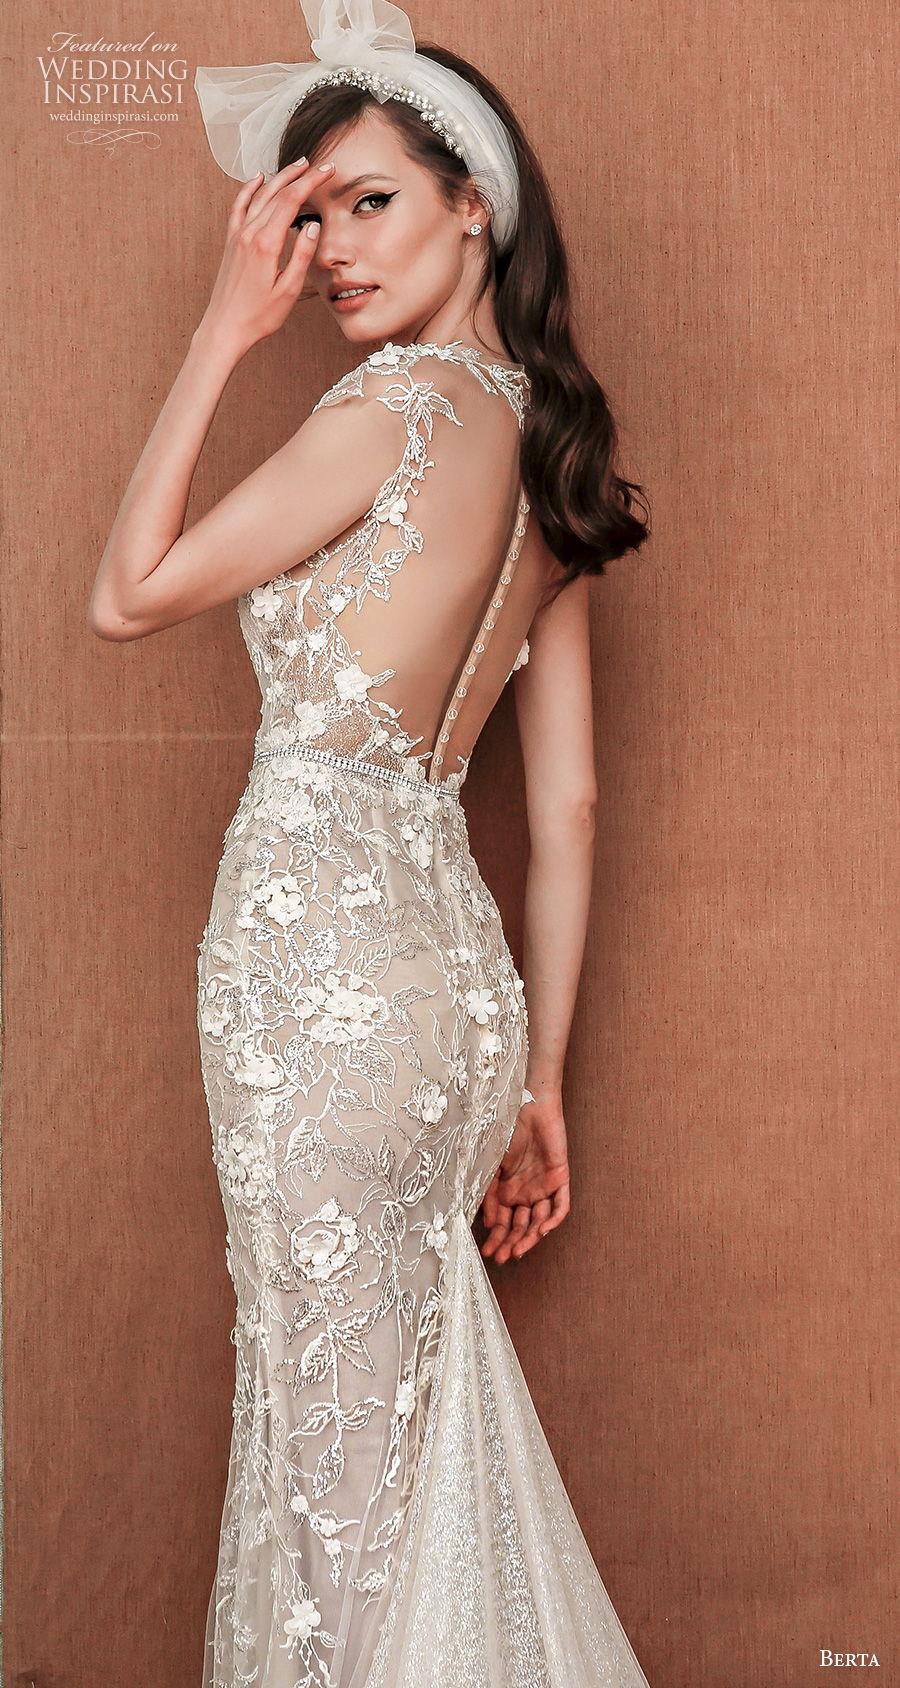 berta spring 2021 privee bridal cap sleeves deep plunging sweetheart neckline full embellishment romantic fit and flare wedding dress sheer button back medium train (5) zbv